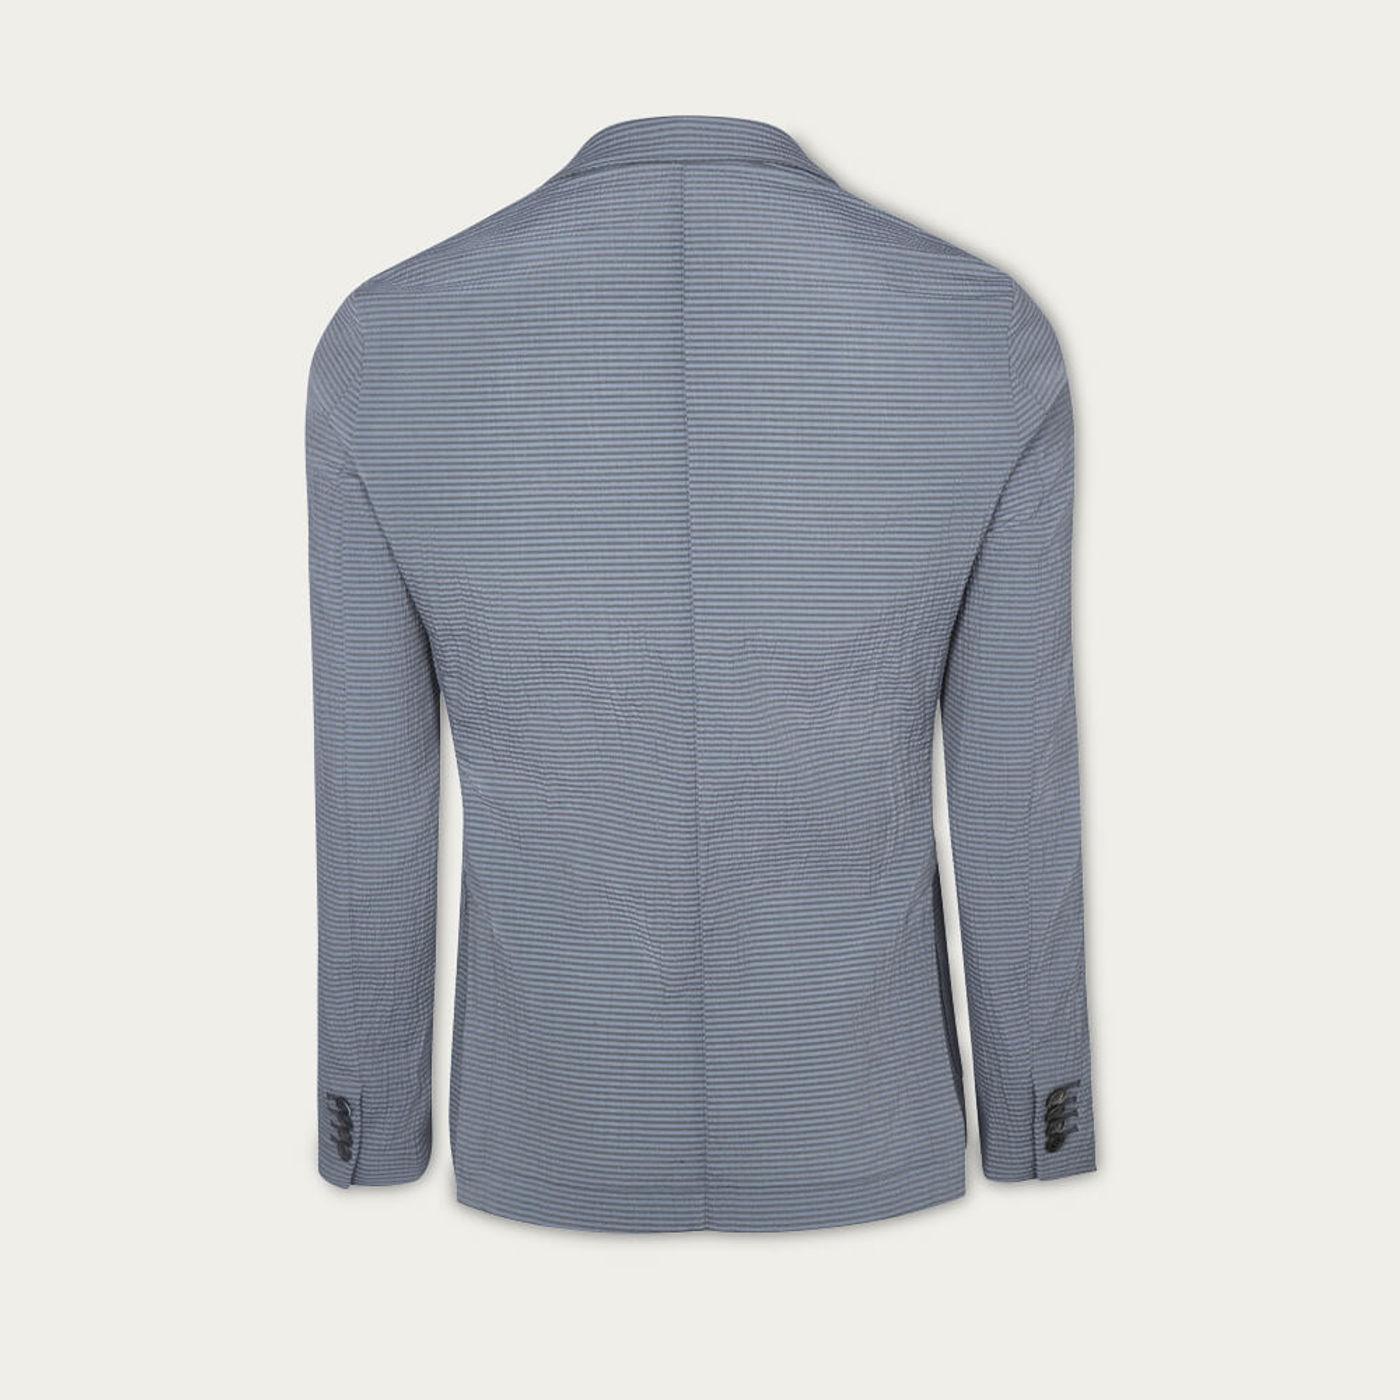 Indigo Seersucker Stripe Jacket   Bombinate